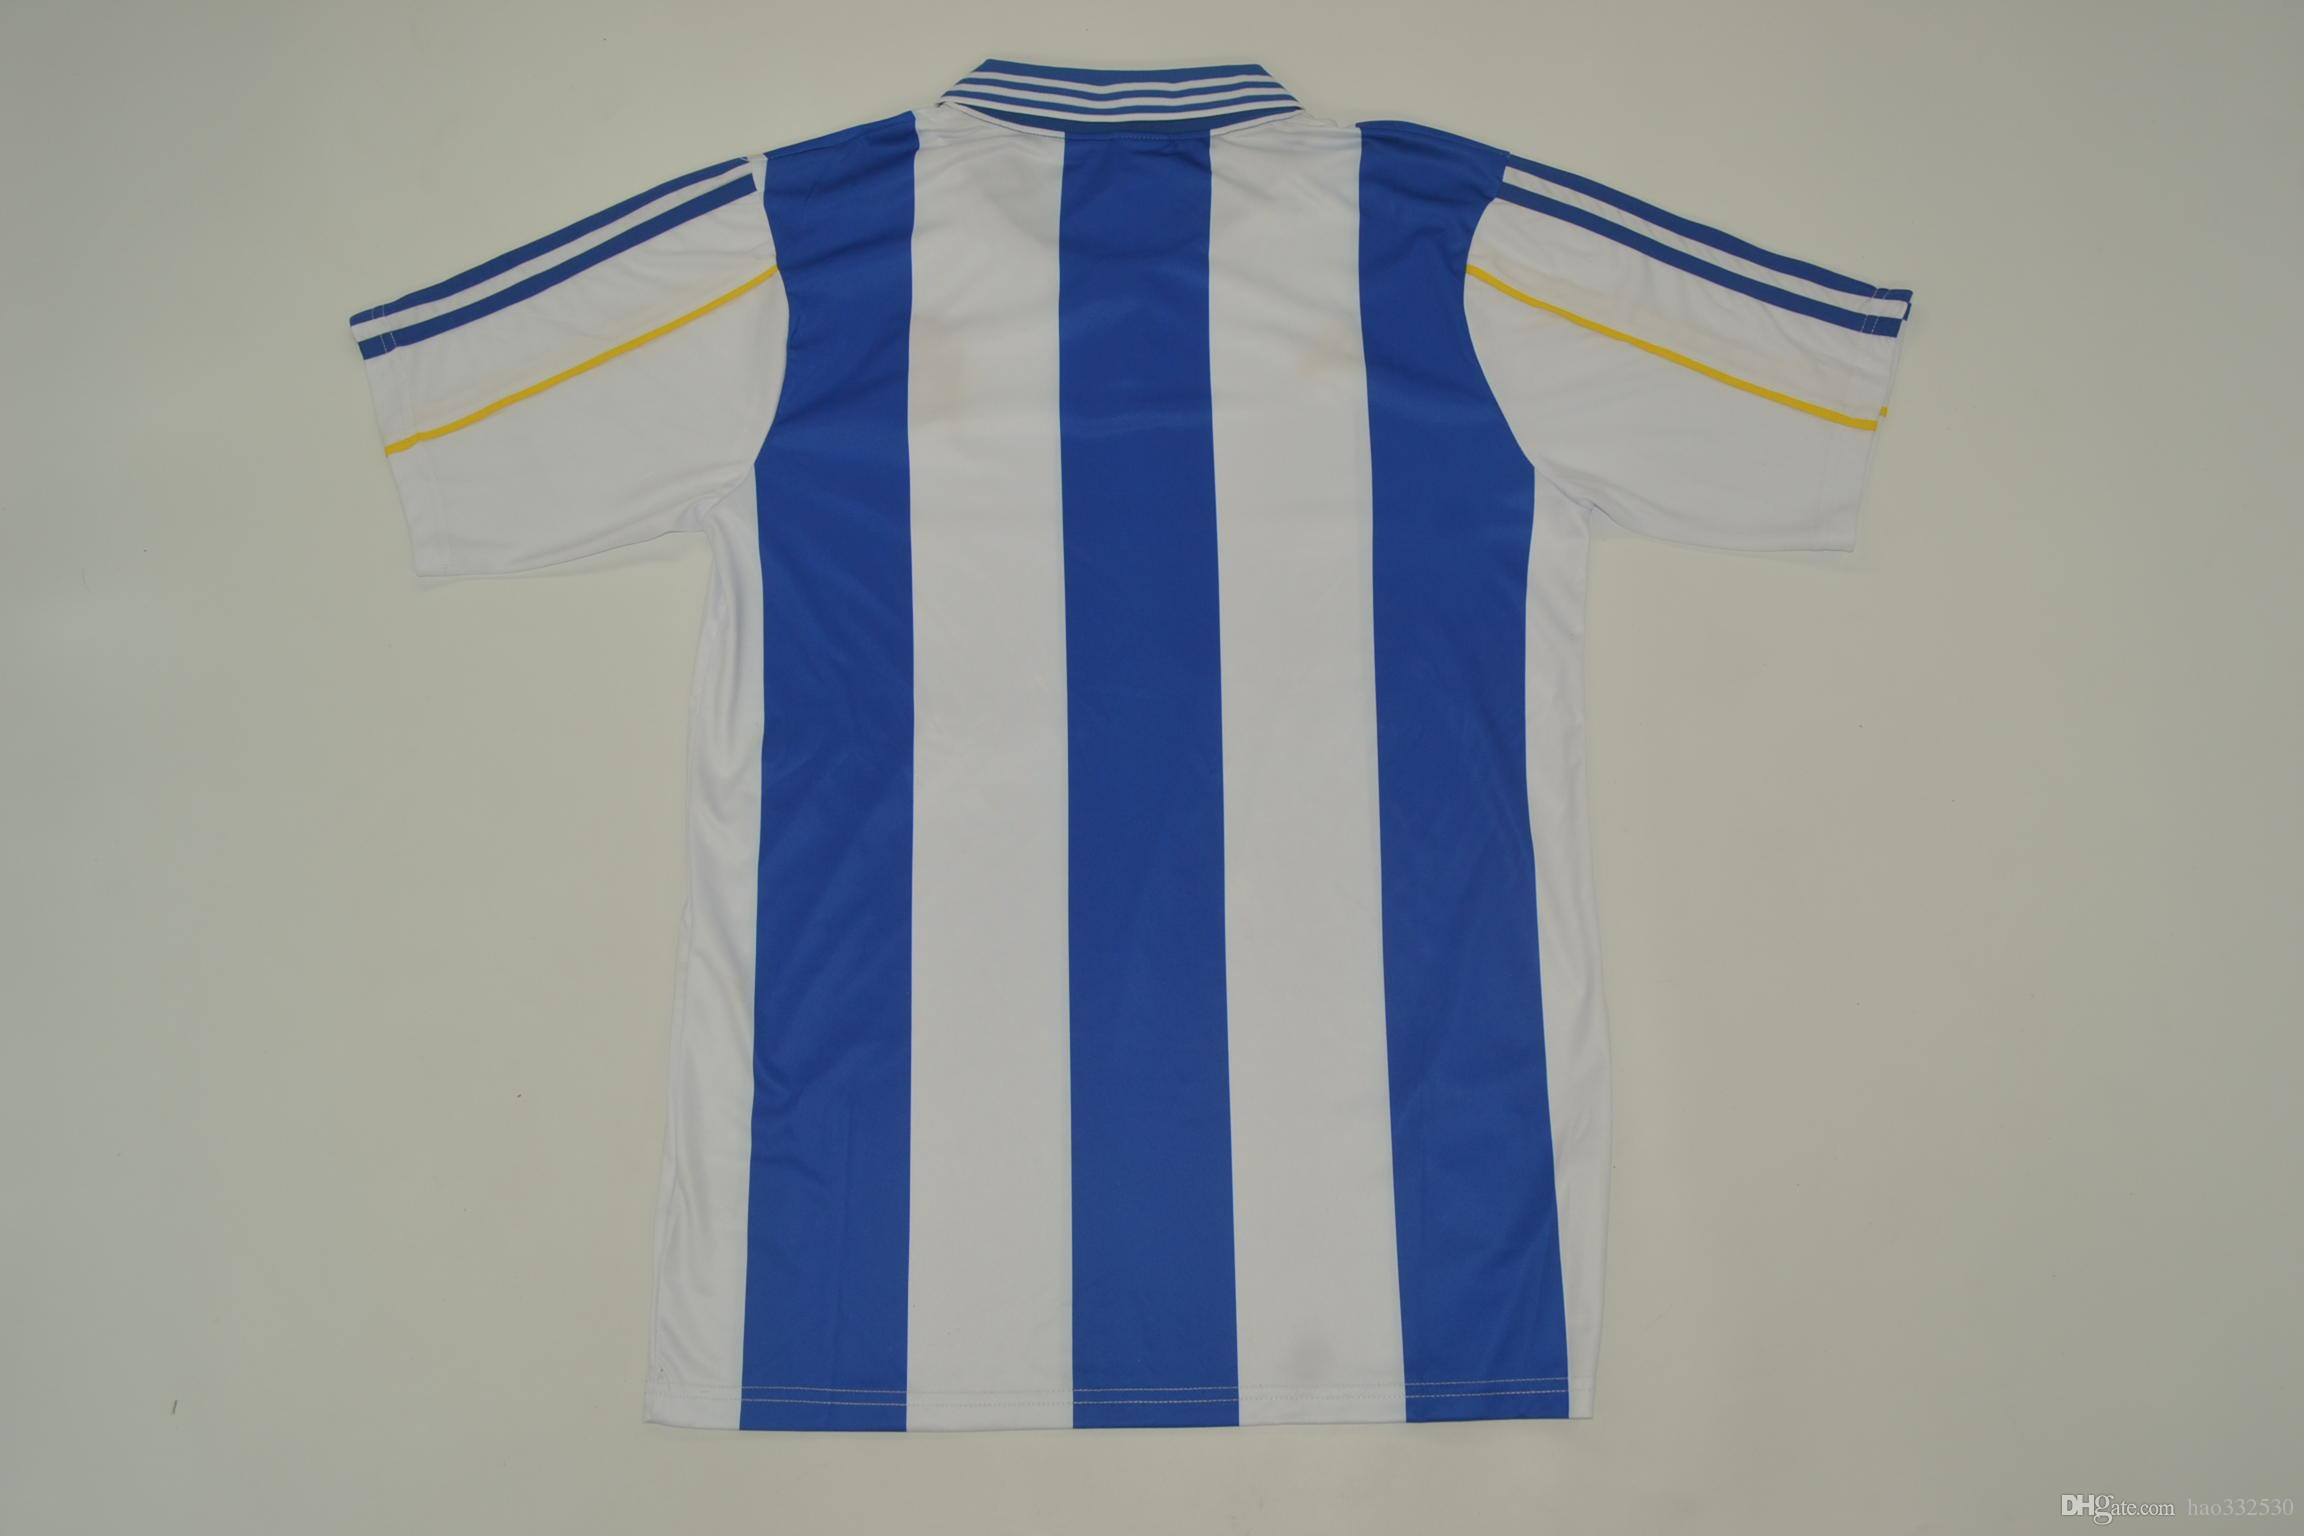 8772166c9 2019 2000 01 Deportivo La Coruna Home Jerseys Classic Shirts Retor  JerseysValerón Mauro Silva Tristán Djalminha Vintage Rugby Jerseys From  Hao332530